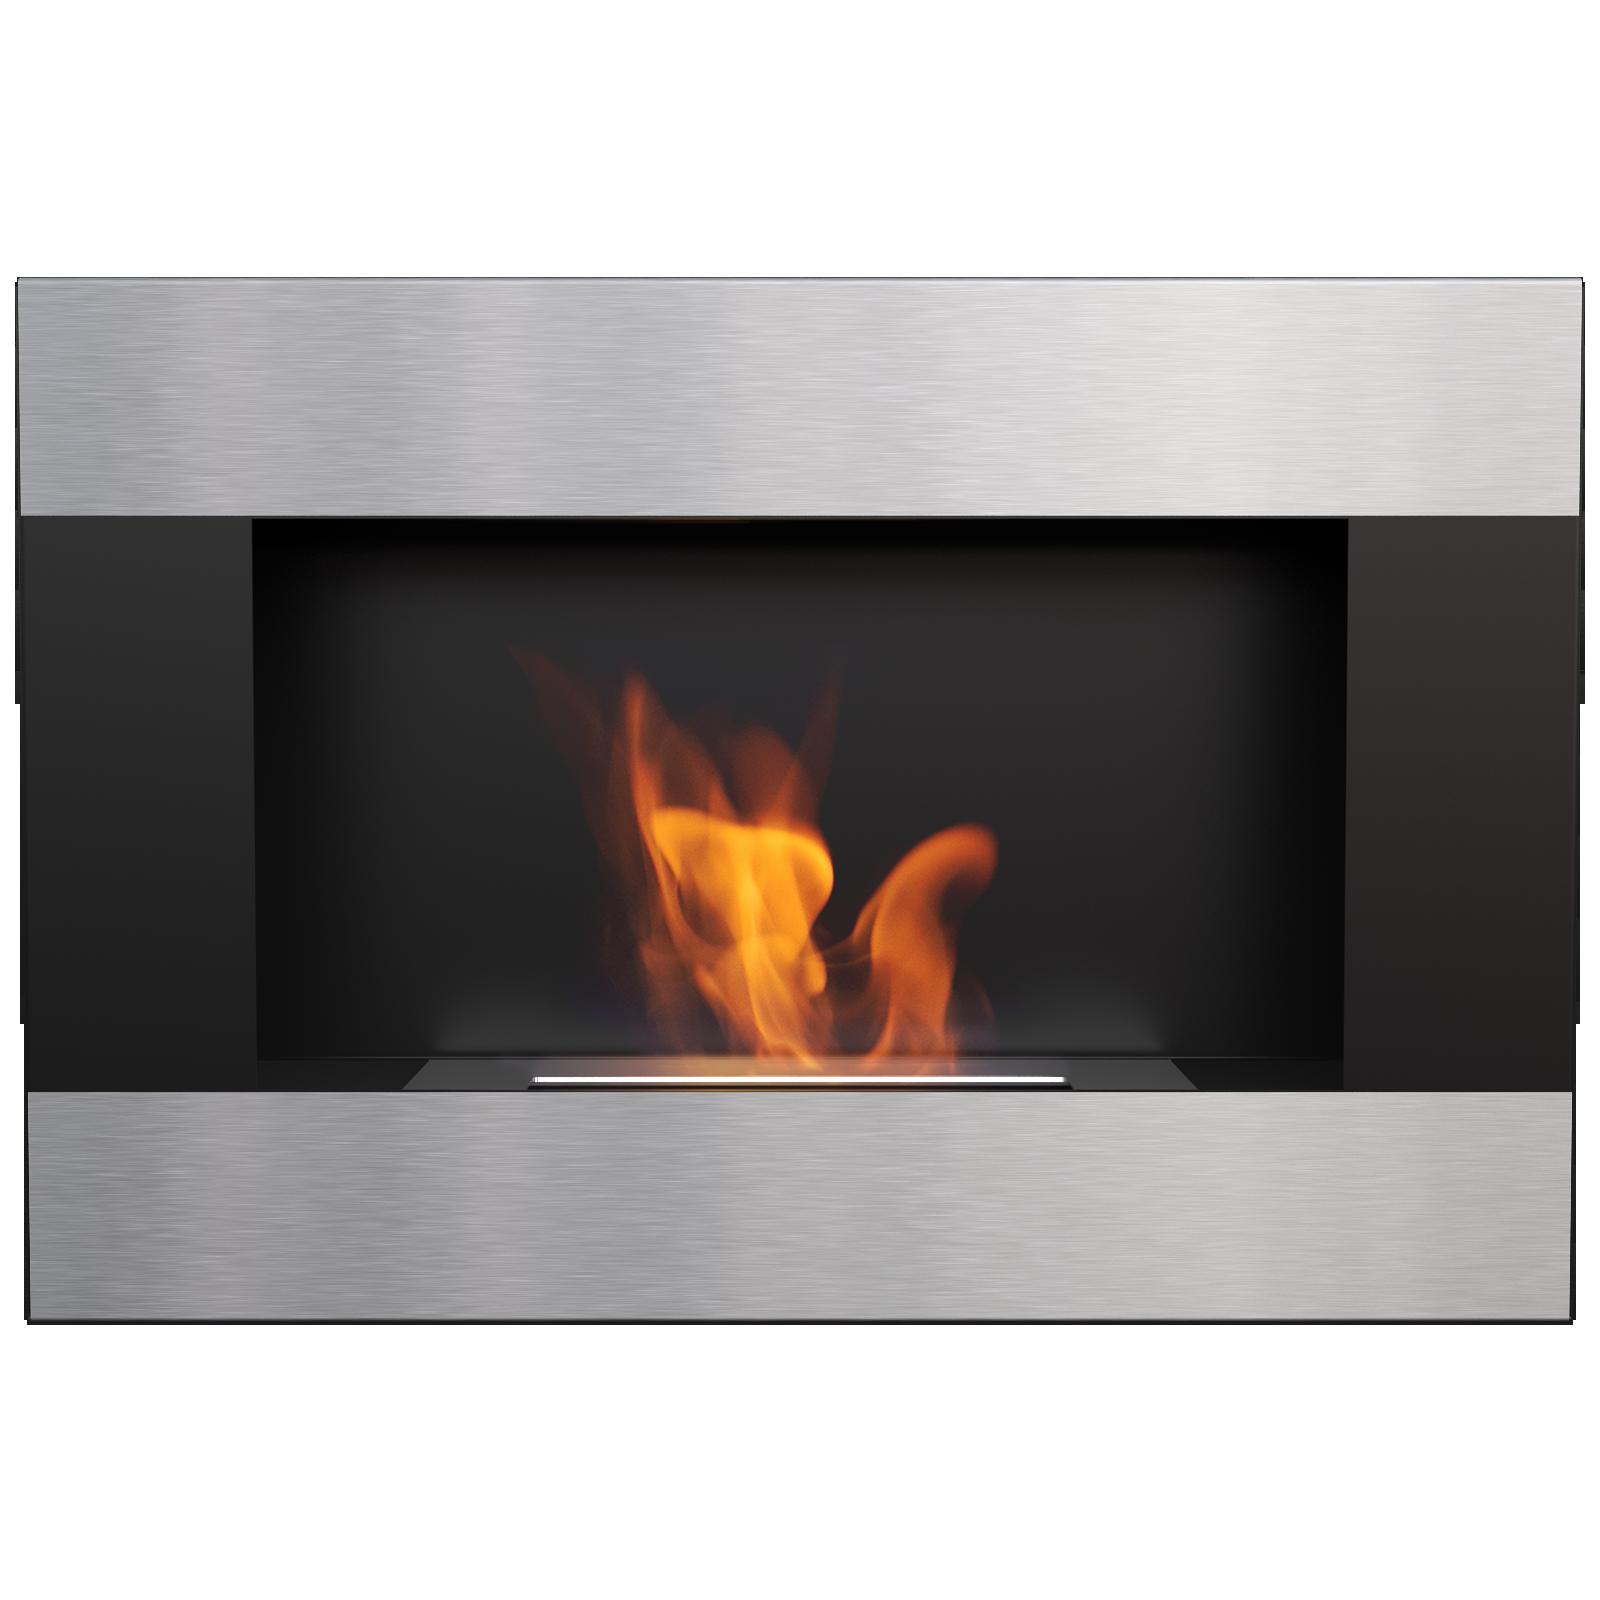 designs mirror insert bathroom lighting toilet modern most to cabinet fireplace bio light over ethanol the